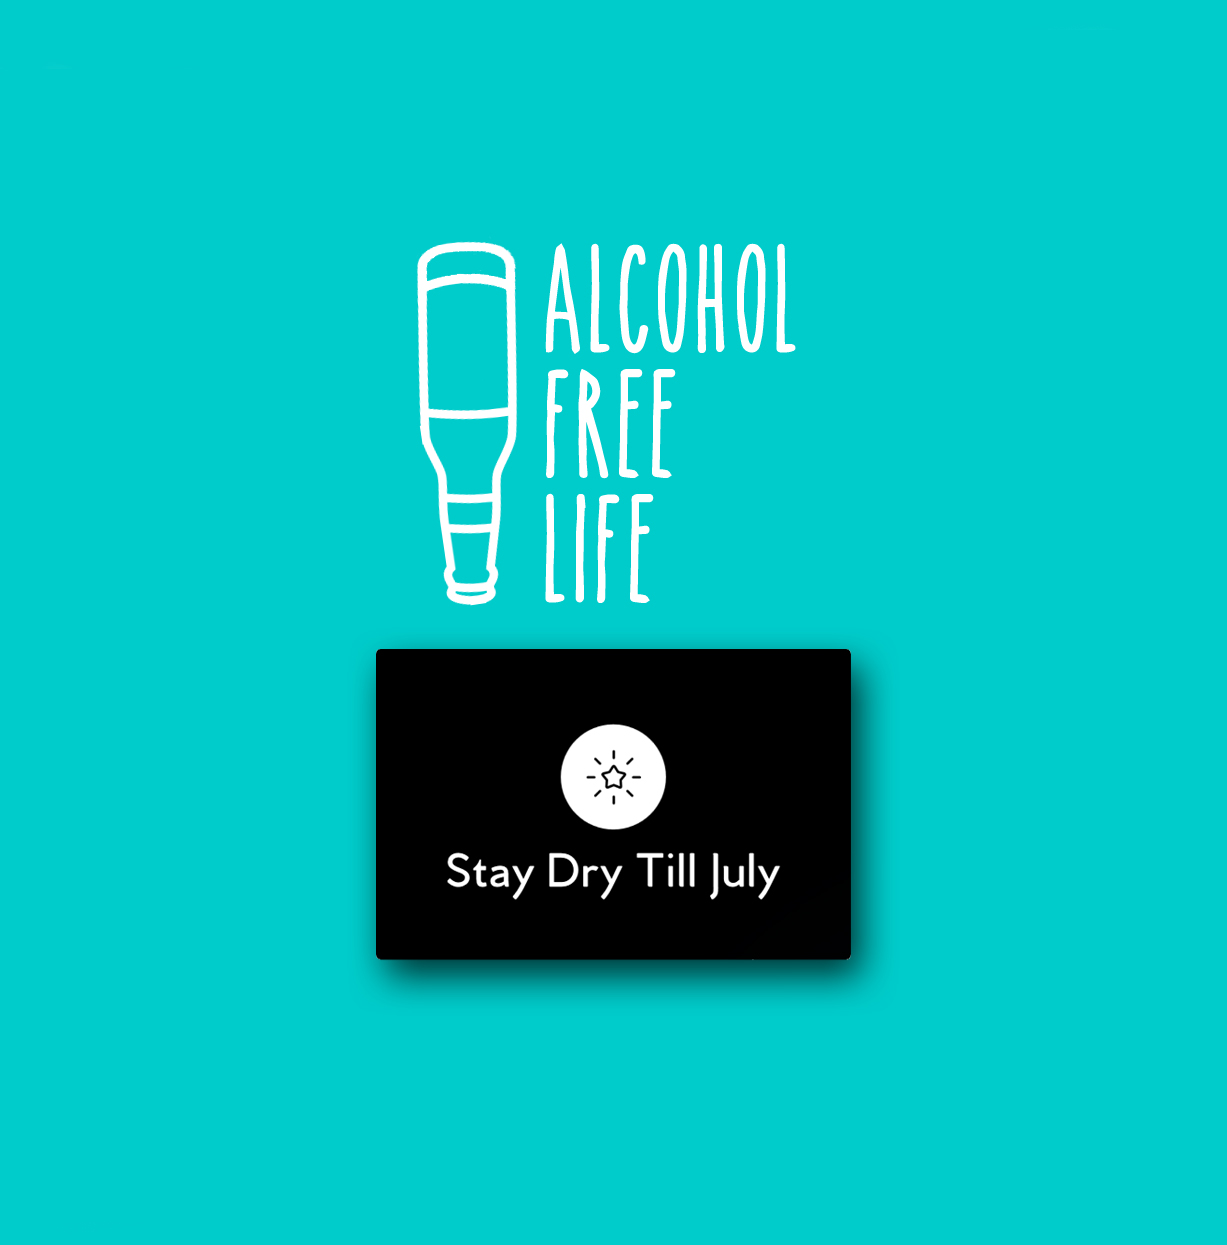 alcohol-free-life_6